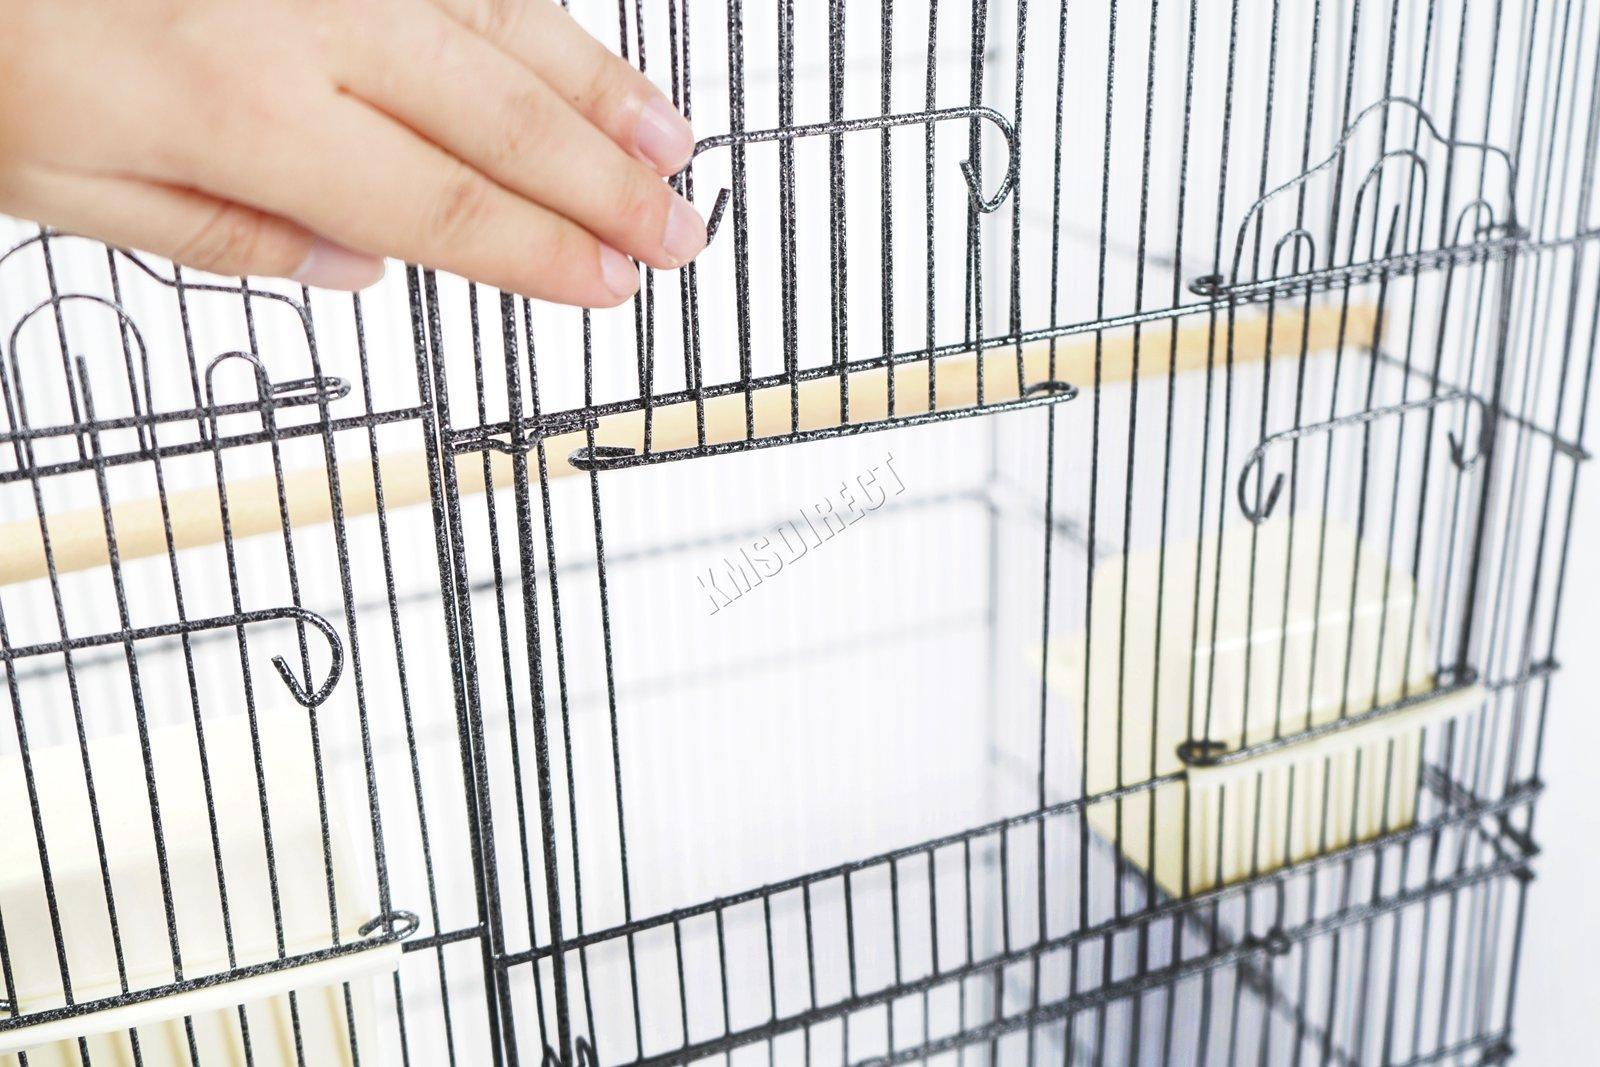 BIRD CAGE METAL MBC 05 HAMMERED SILVER KMSWM11 - Foxhunter Grande Metal Jaula con Soporte Pajarera Loro Periquito Canario Cacatua